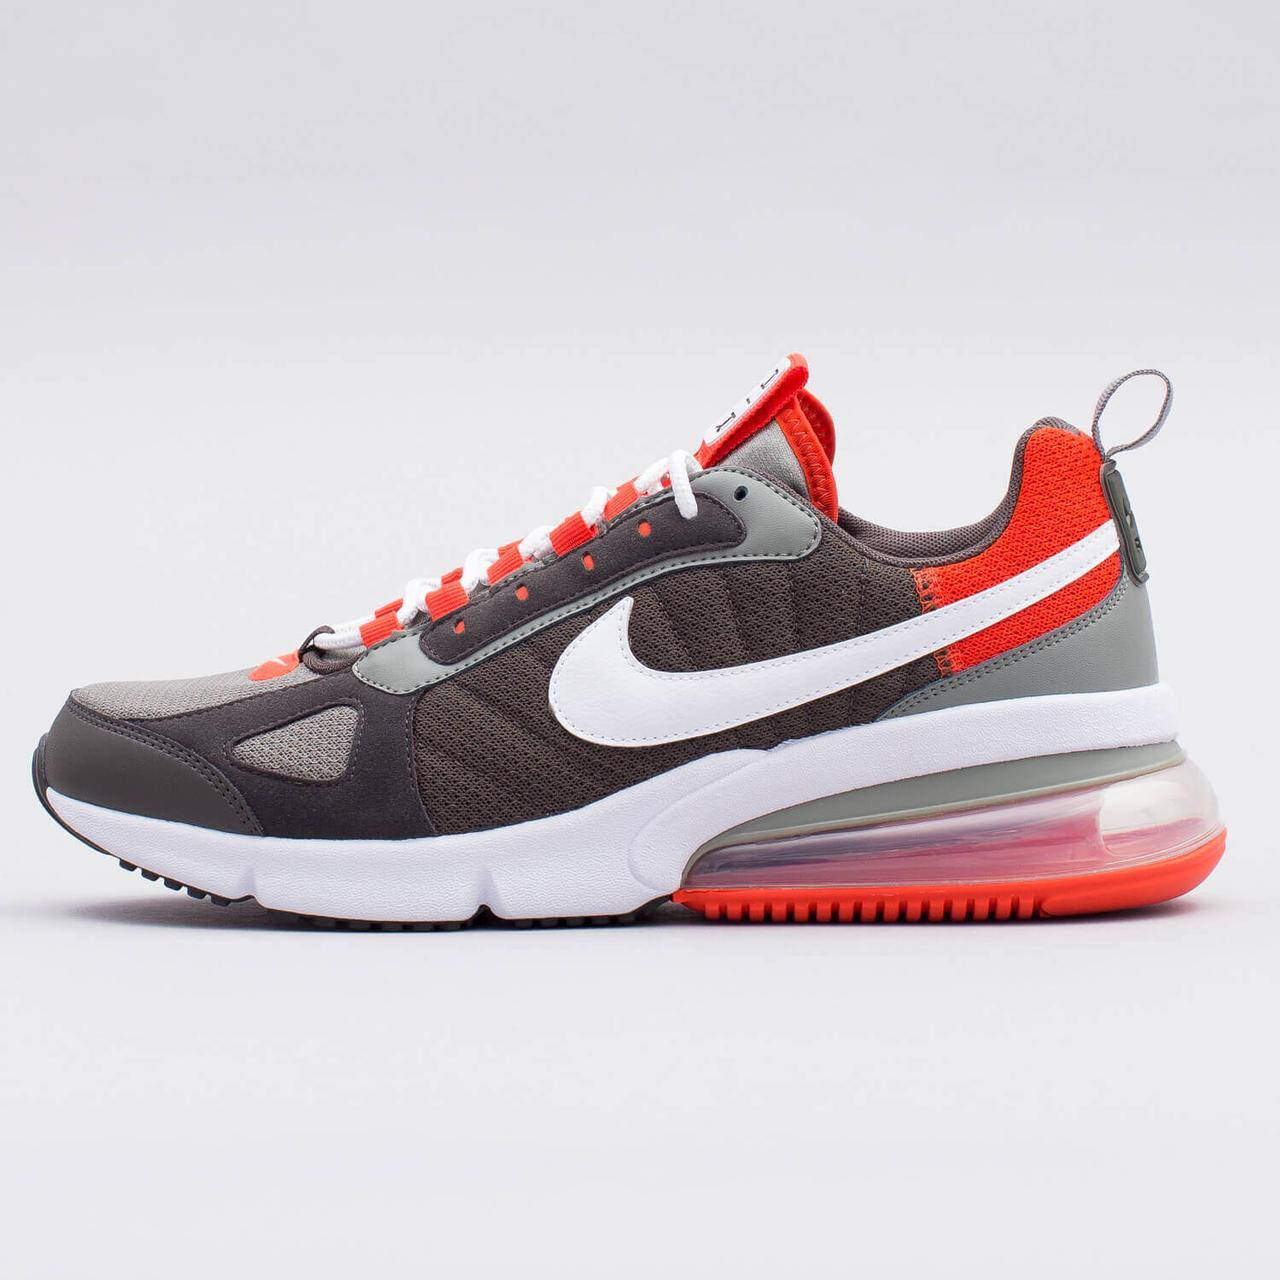 51bc530f Мужские кроссовки Nike Air Max 270 Futura AO1569-002 - Parallel-Brandshop.  Оригинальная